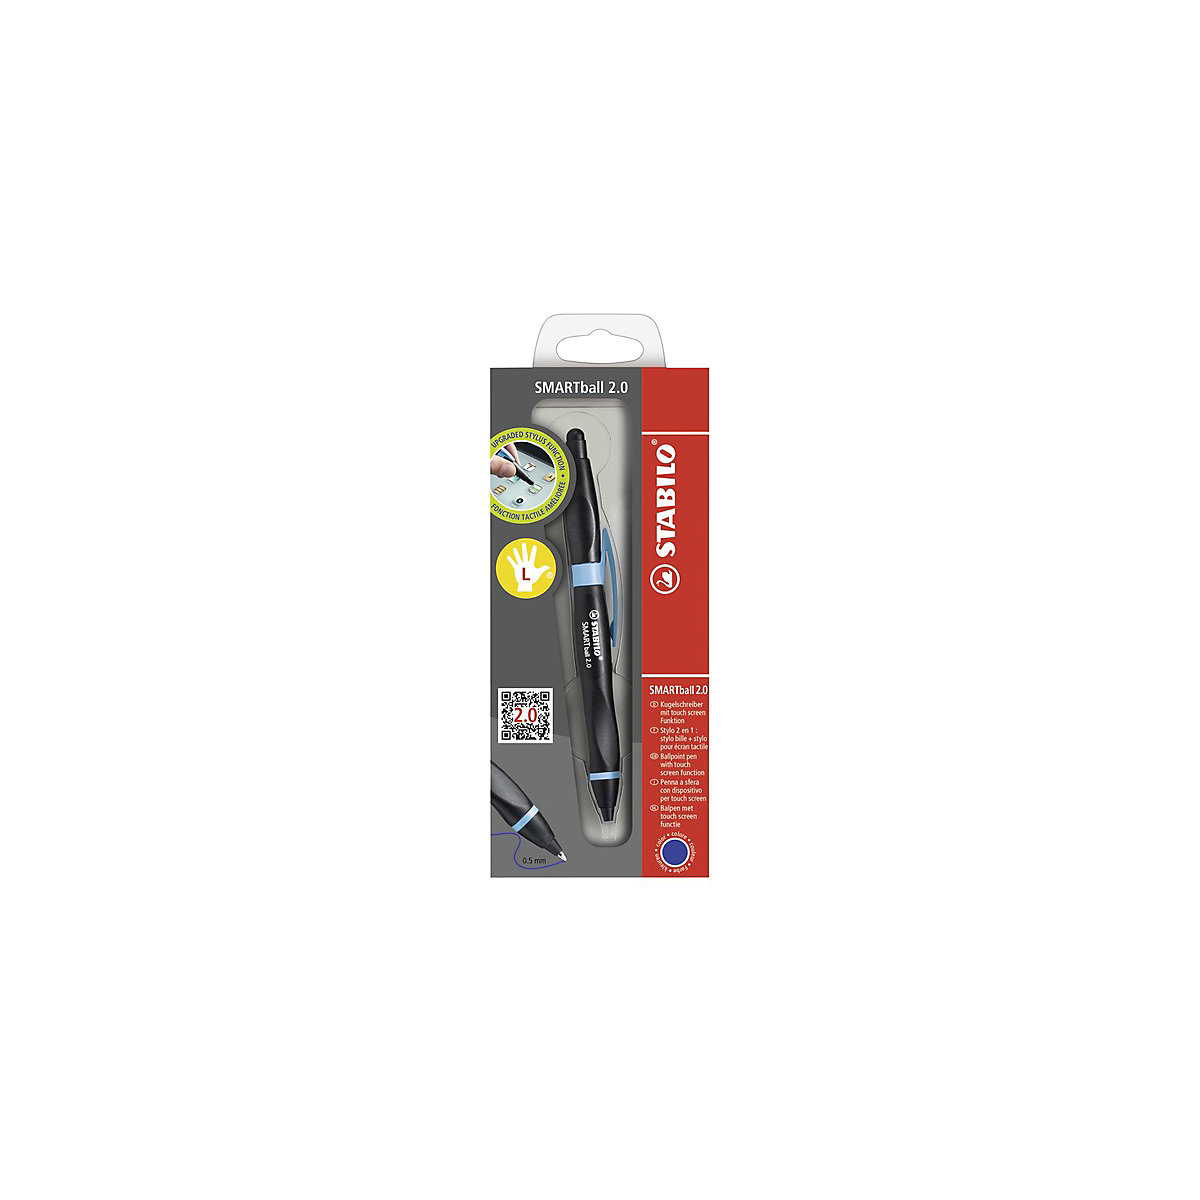 STABILO Ручка захвата 7754156 ручки шариковые гелевые карандаши Пишущие принадлежности MTpromo